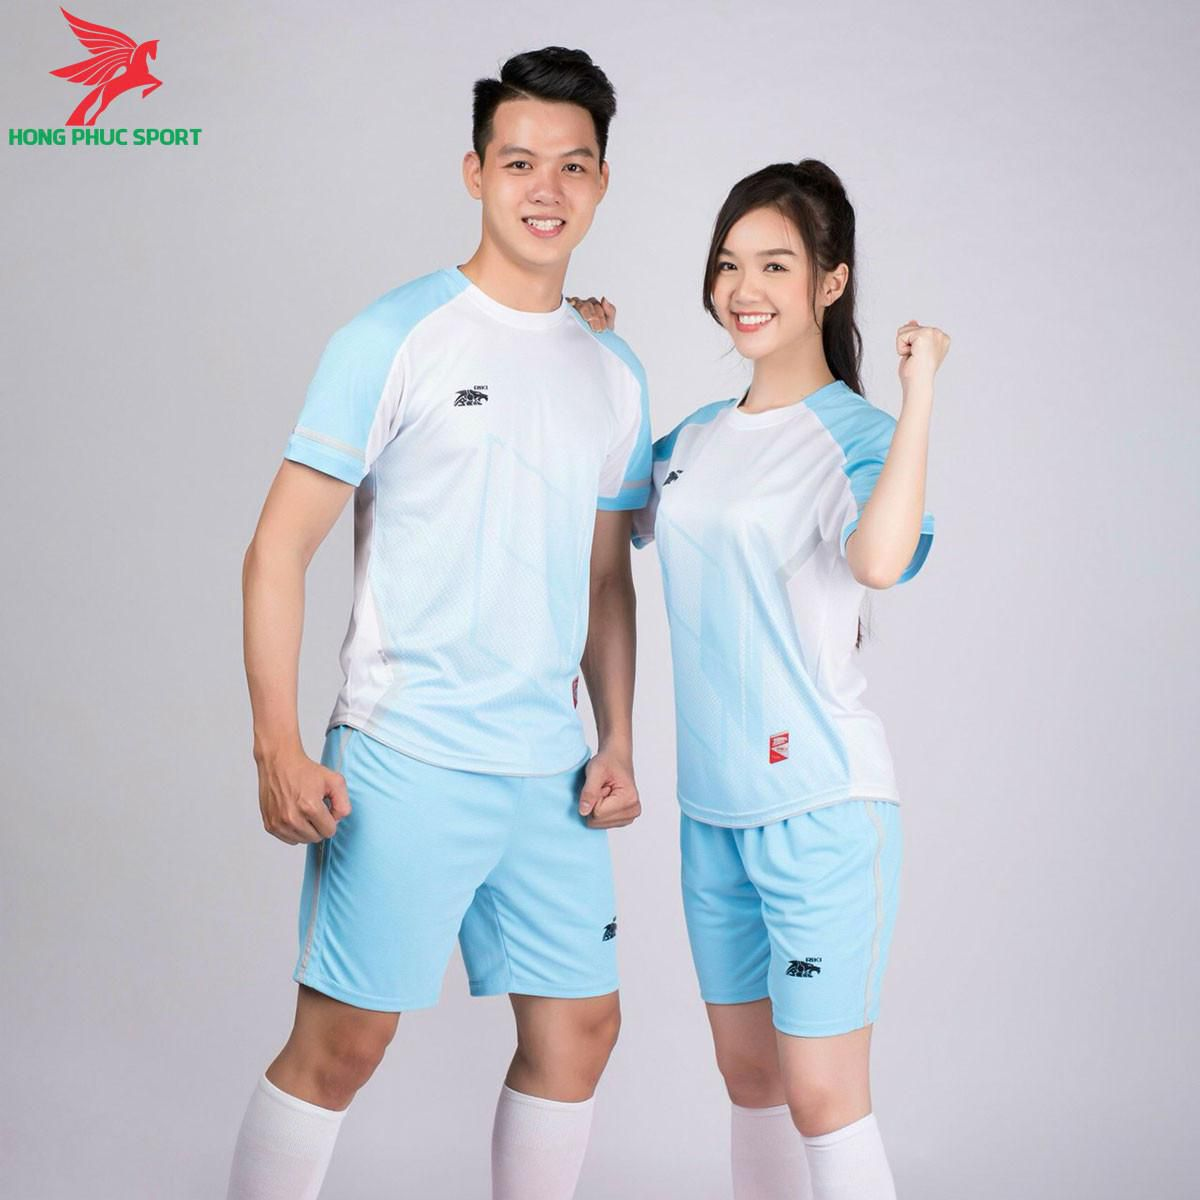 https://cdn.hongphucsport.com/unsafe/s4.shopbay.vn/files/285/ao-khong-logo-riki-airmaxx-mau-thien-thanh-2-603eef0465ad0.jpg